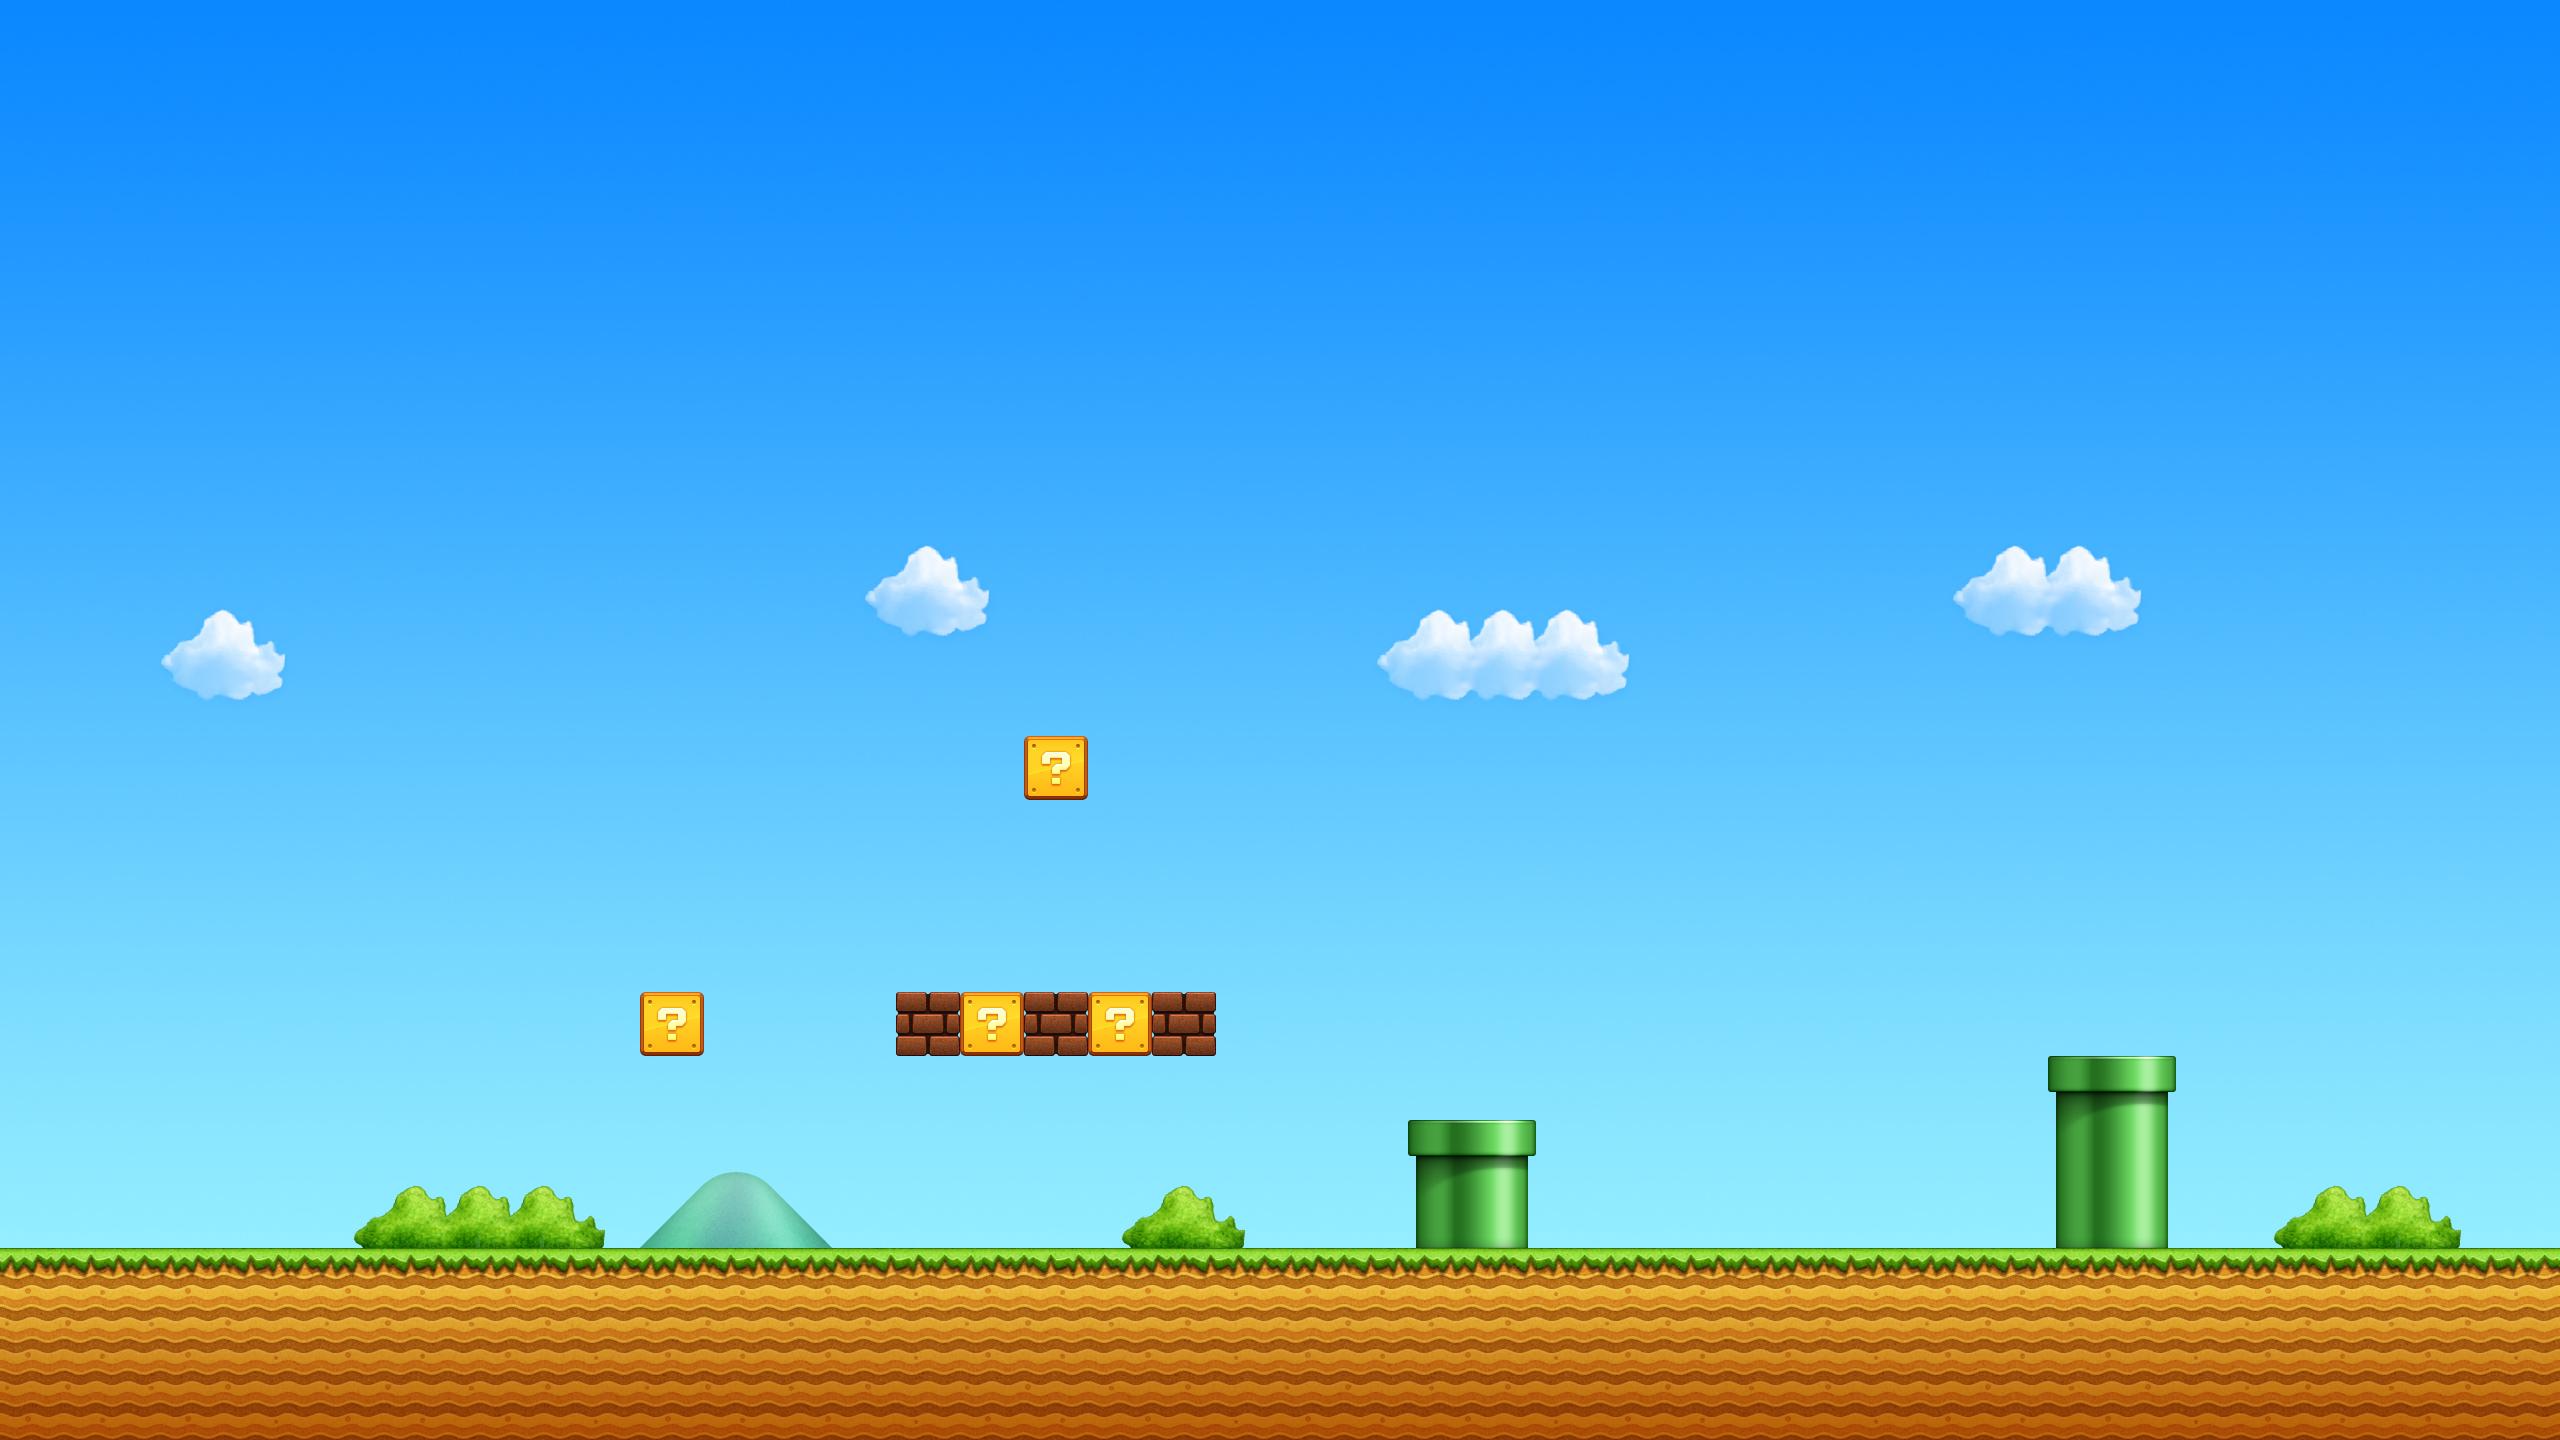 Mario bros background - SF Wallpaper